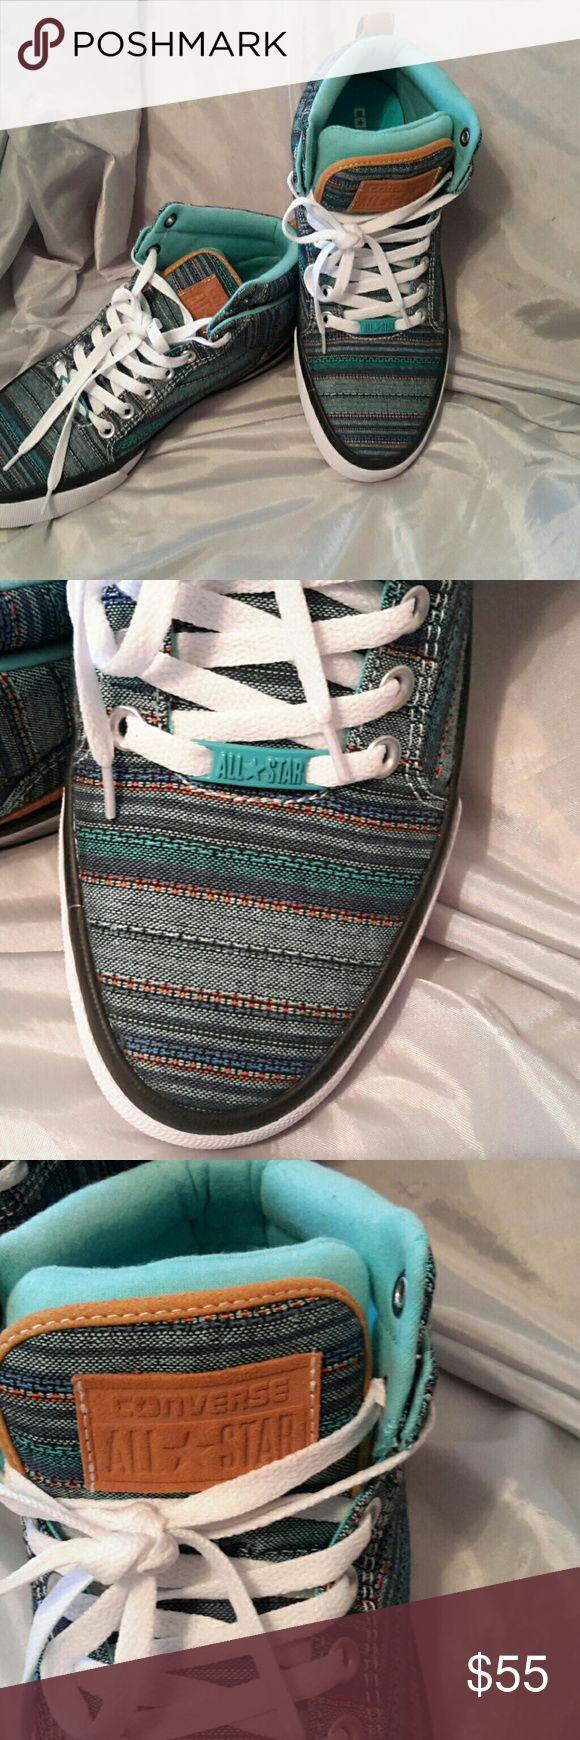 Men's converse all star aqua blue fabric NWOT Suede trim size 9 (hL) Converse Shoes Sneakers